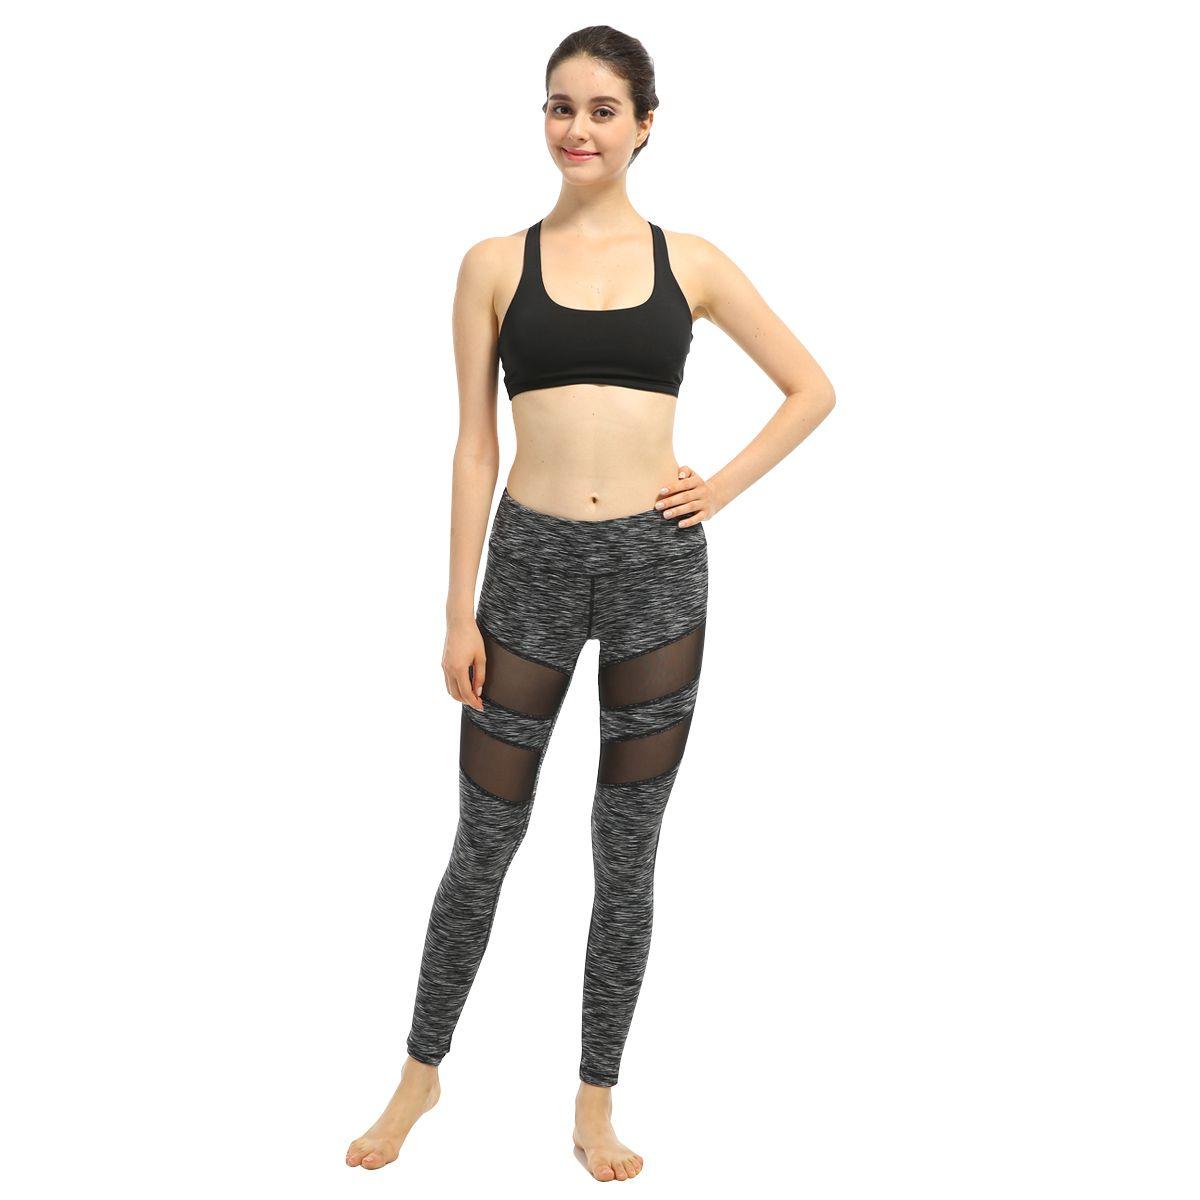 2017 frühling frauen sexy yoga sport hosen kompression leggings hohl mesh leggings gym dünne yoga fitness sportbekleidung